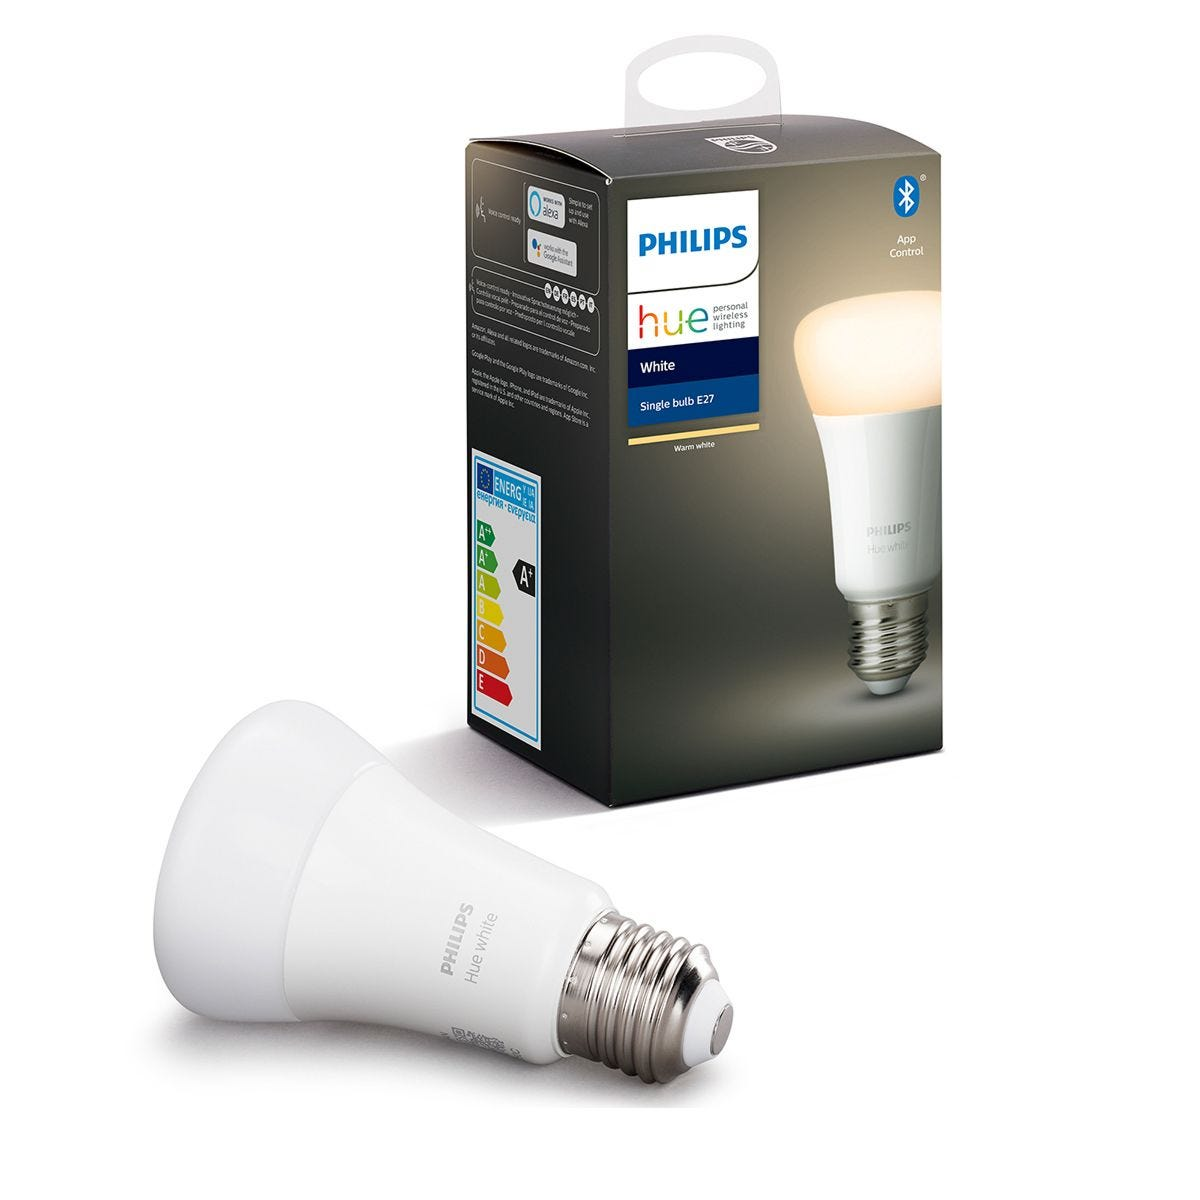 Philips Hue Smart Wi-Fi Dimmable White E27 60W Bluetooth Light Bulb